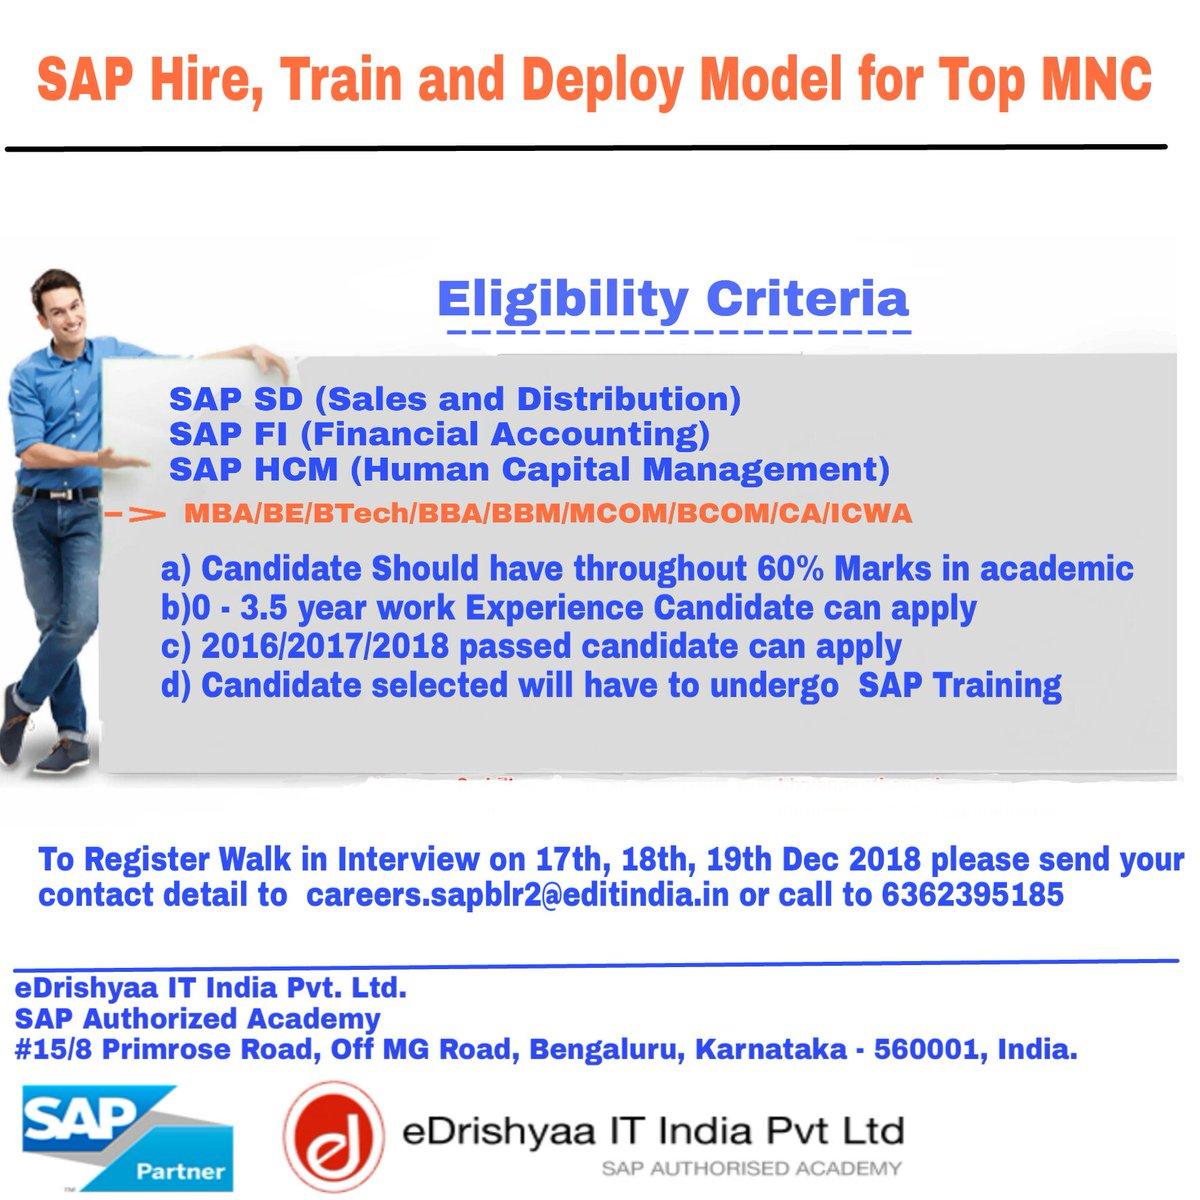 eDrishyaa SAP Academy @ Bangalore & Coimbatore on Twitter: